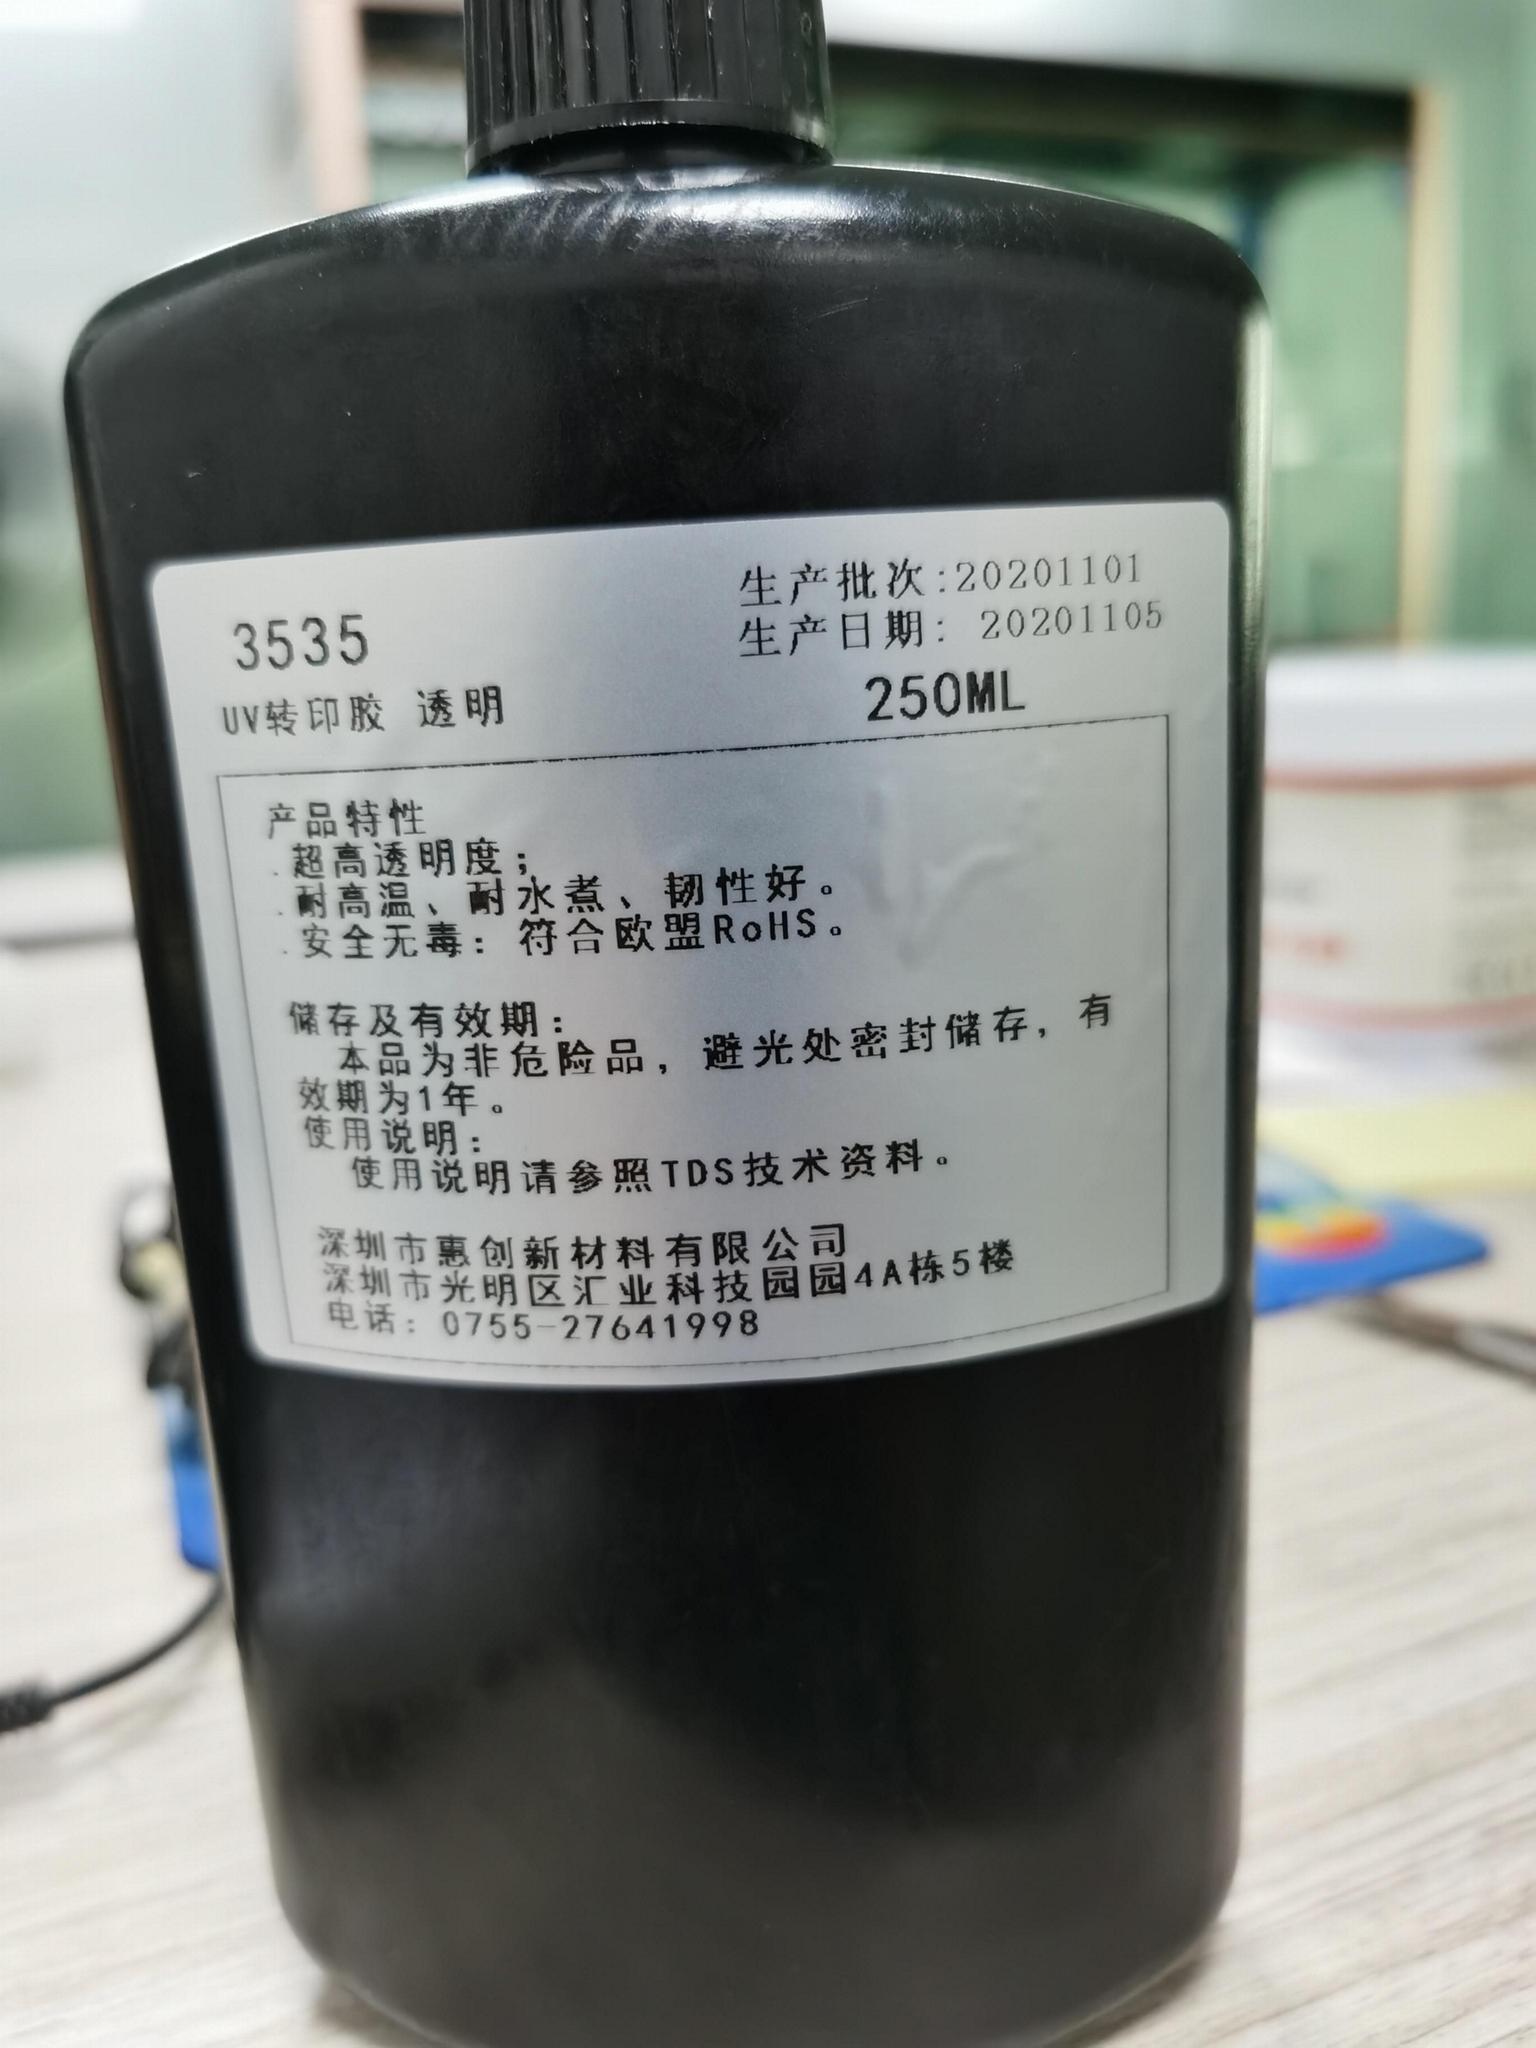 Water - resistant UV transfer adhesive 2